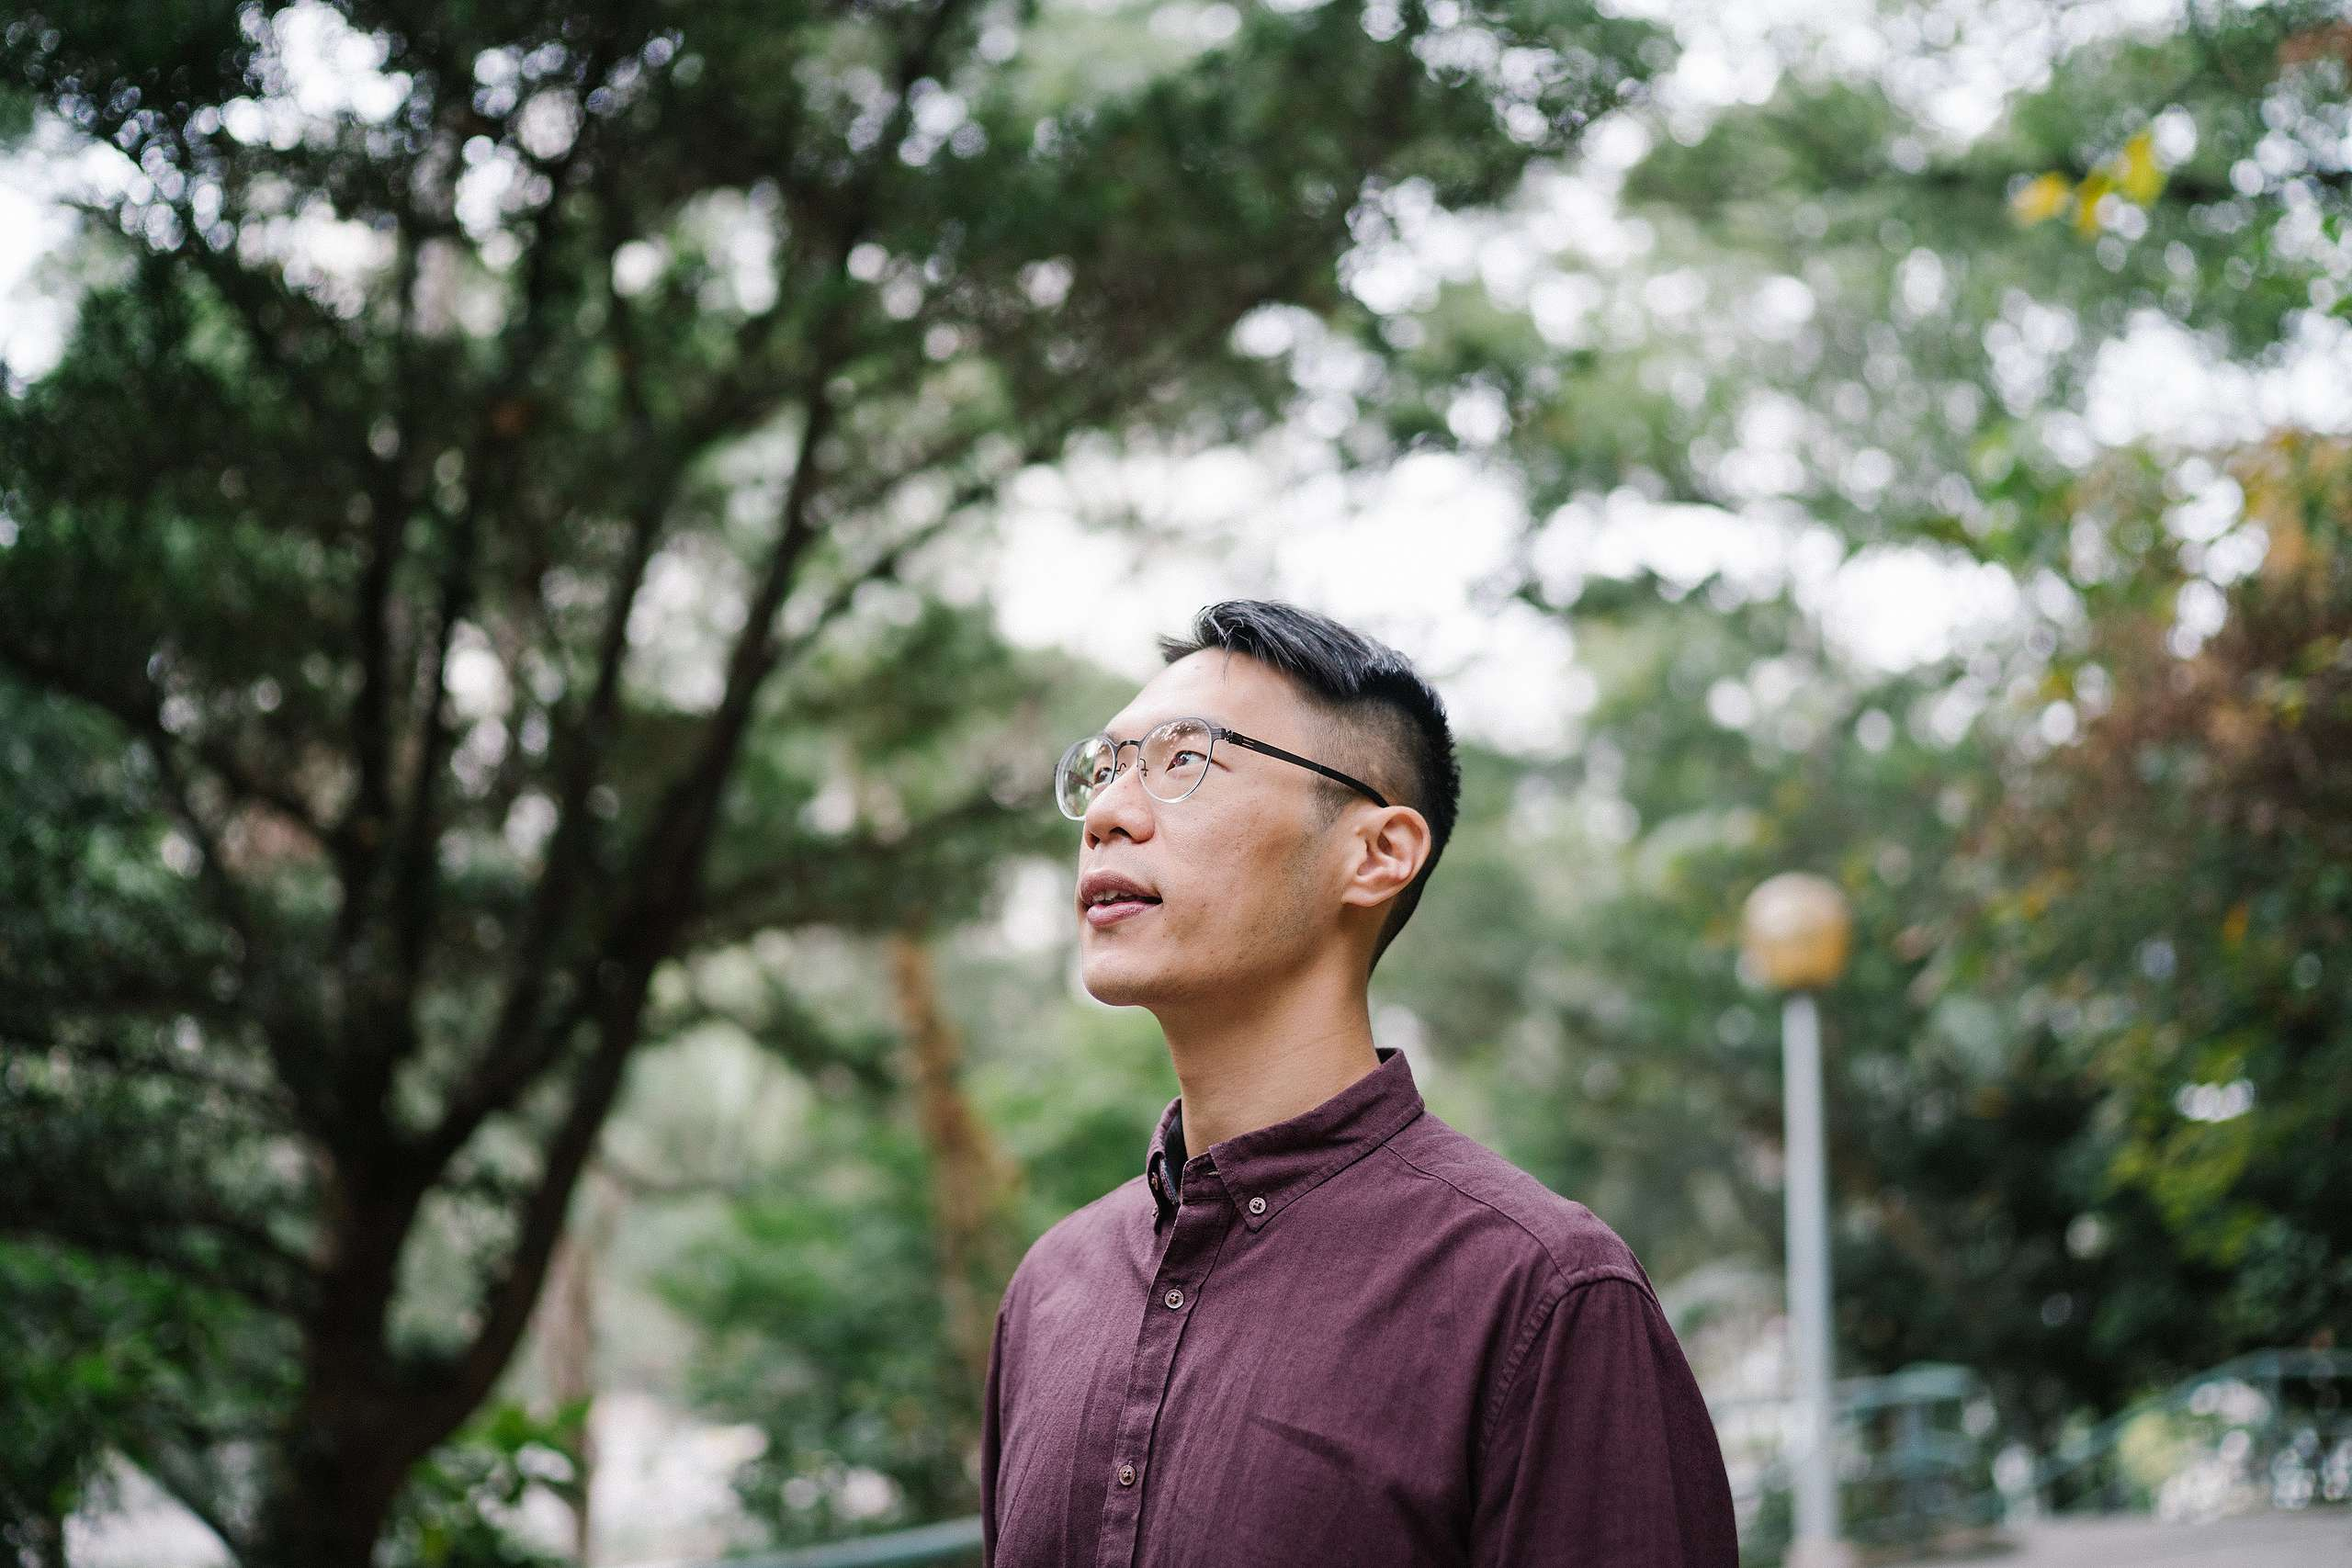 Billy分享自己的太陽能經驗,是希望大家領會可再生能源並不是遙遠的議題,而是可以接觸到、做到的。© Patrick Cho / Greenpeace